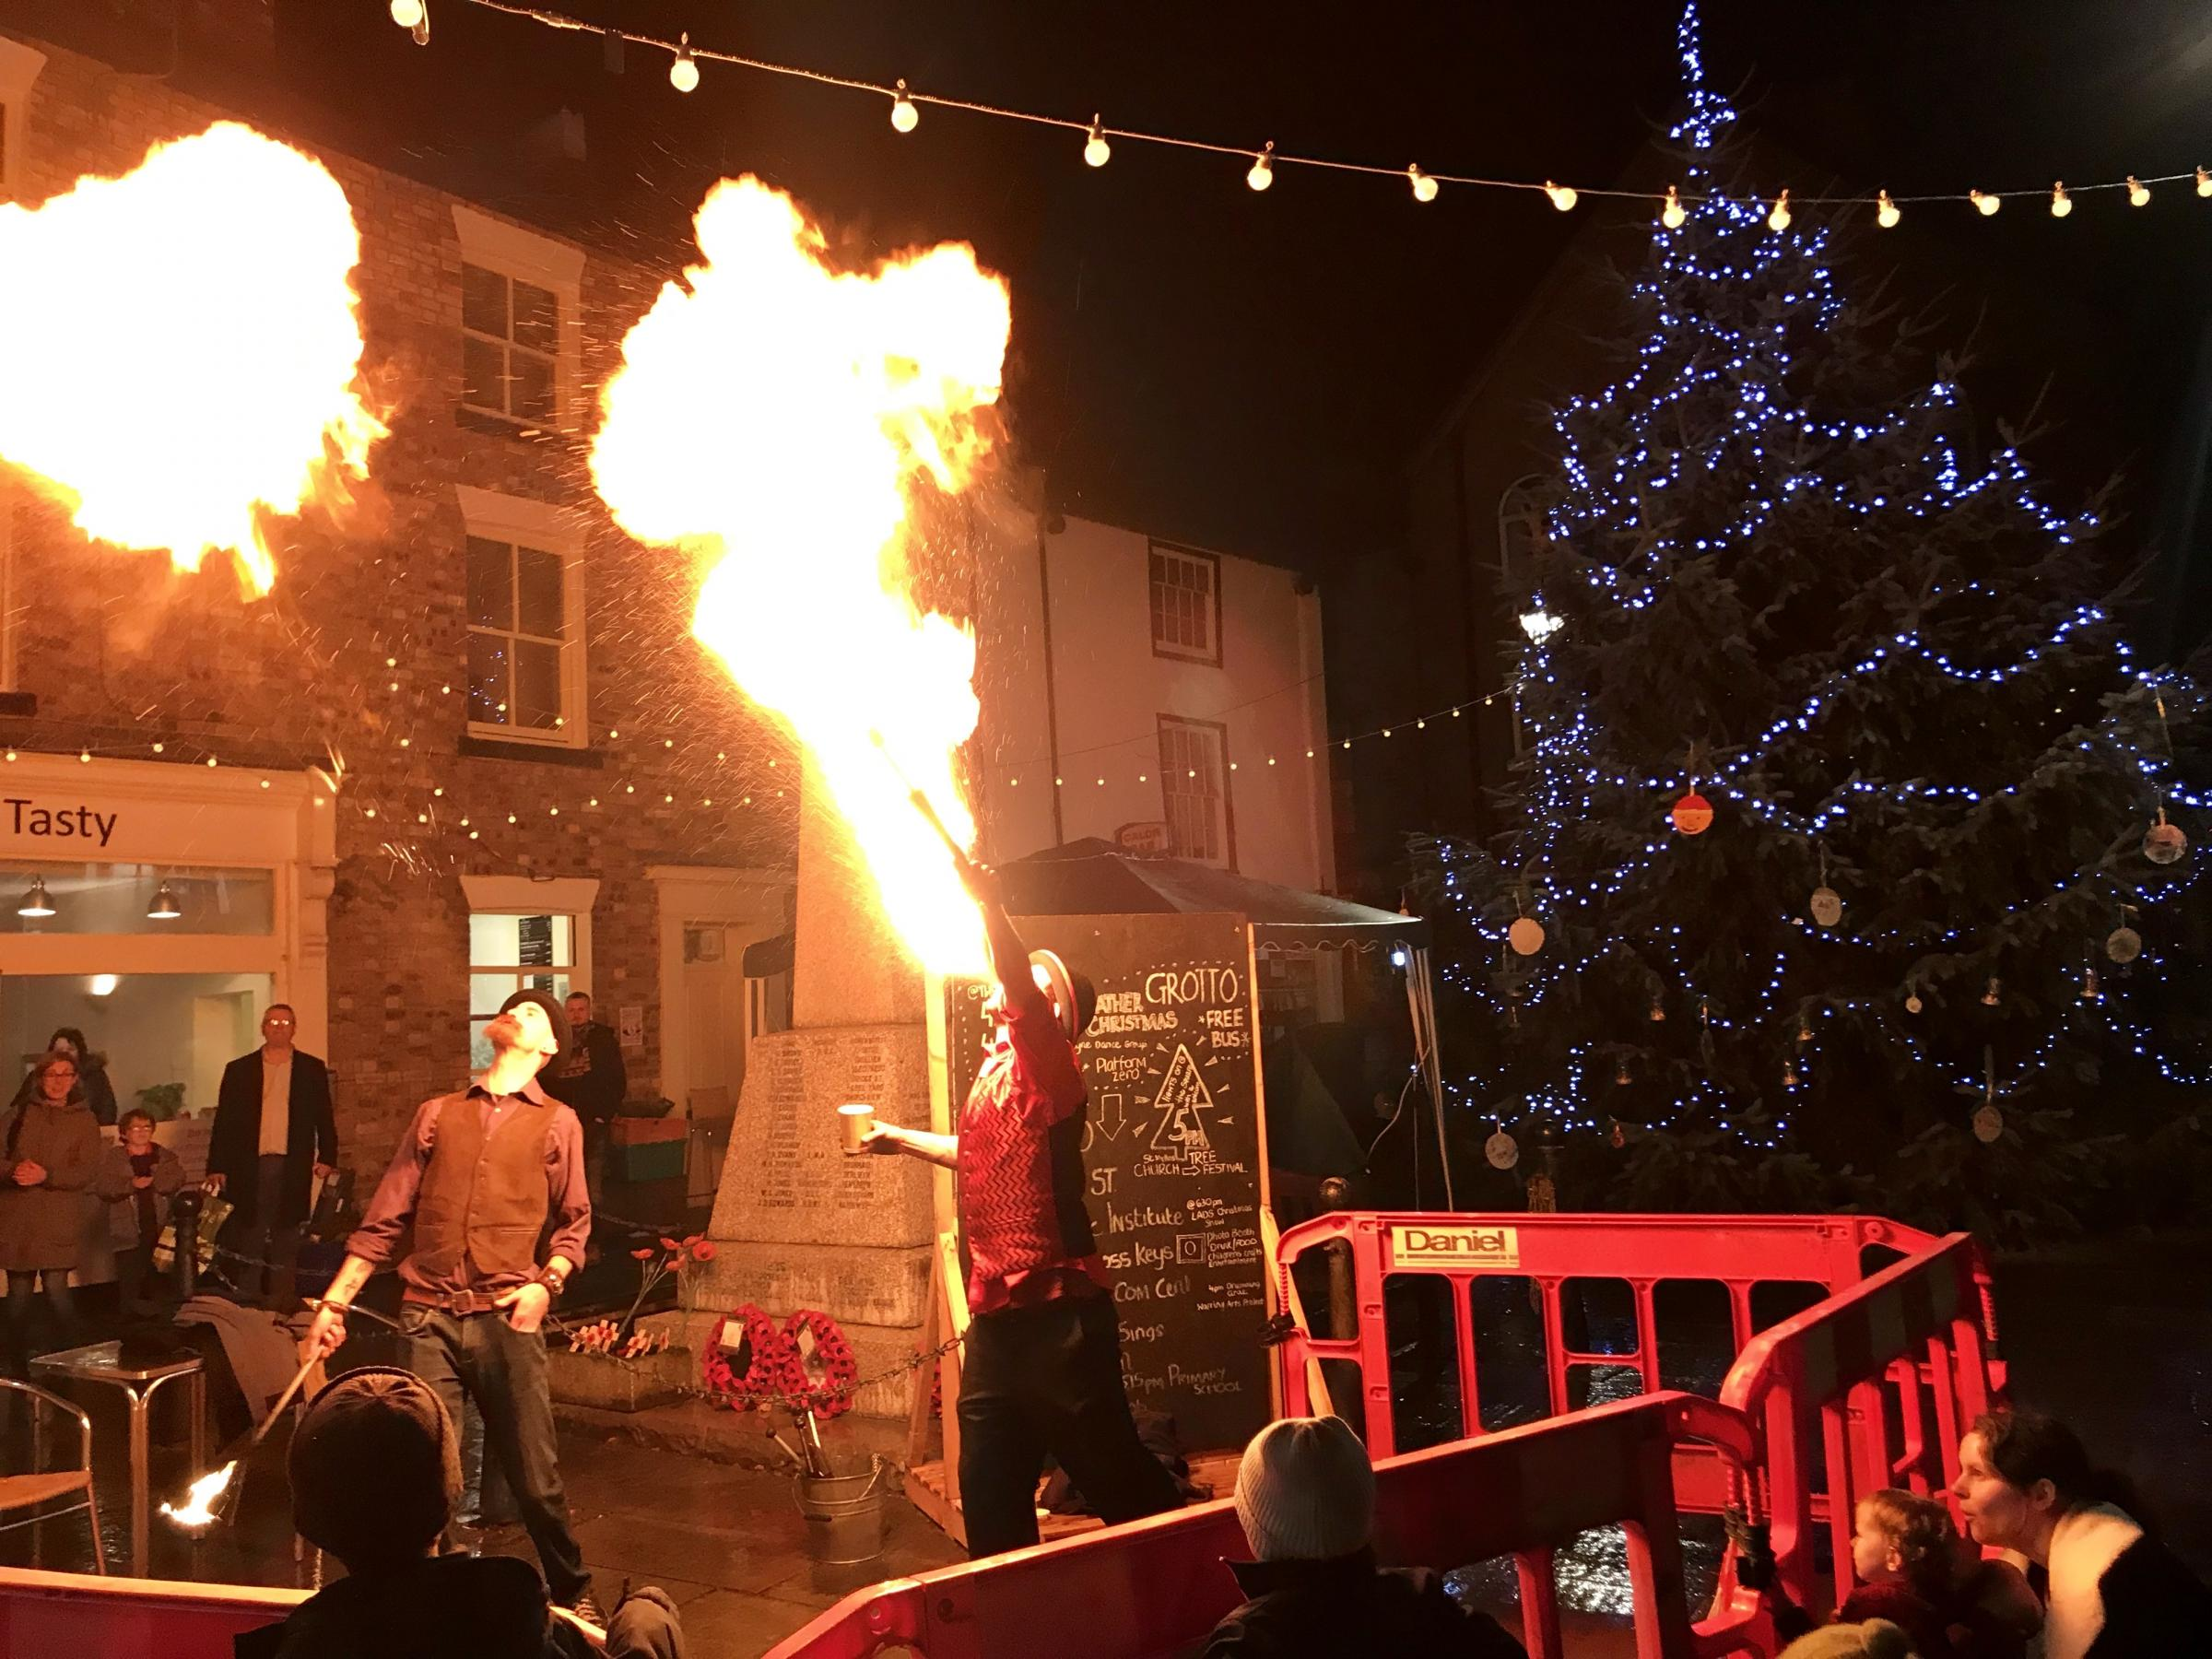 Llanfyllin Christmas Markets draws the crowds